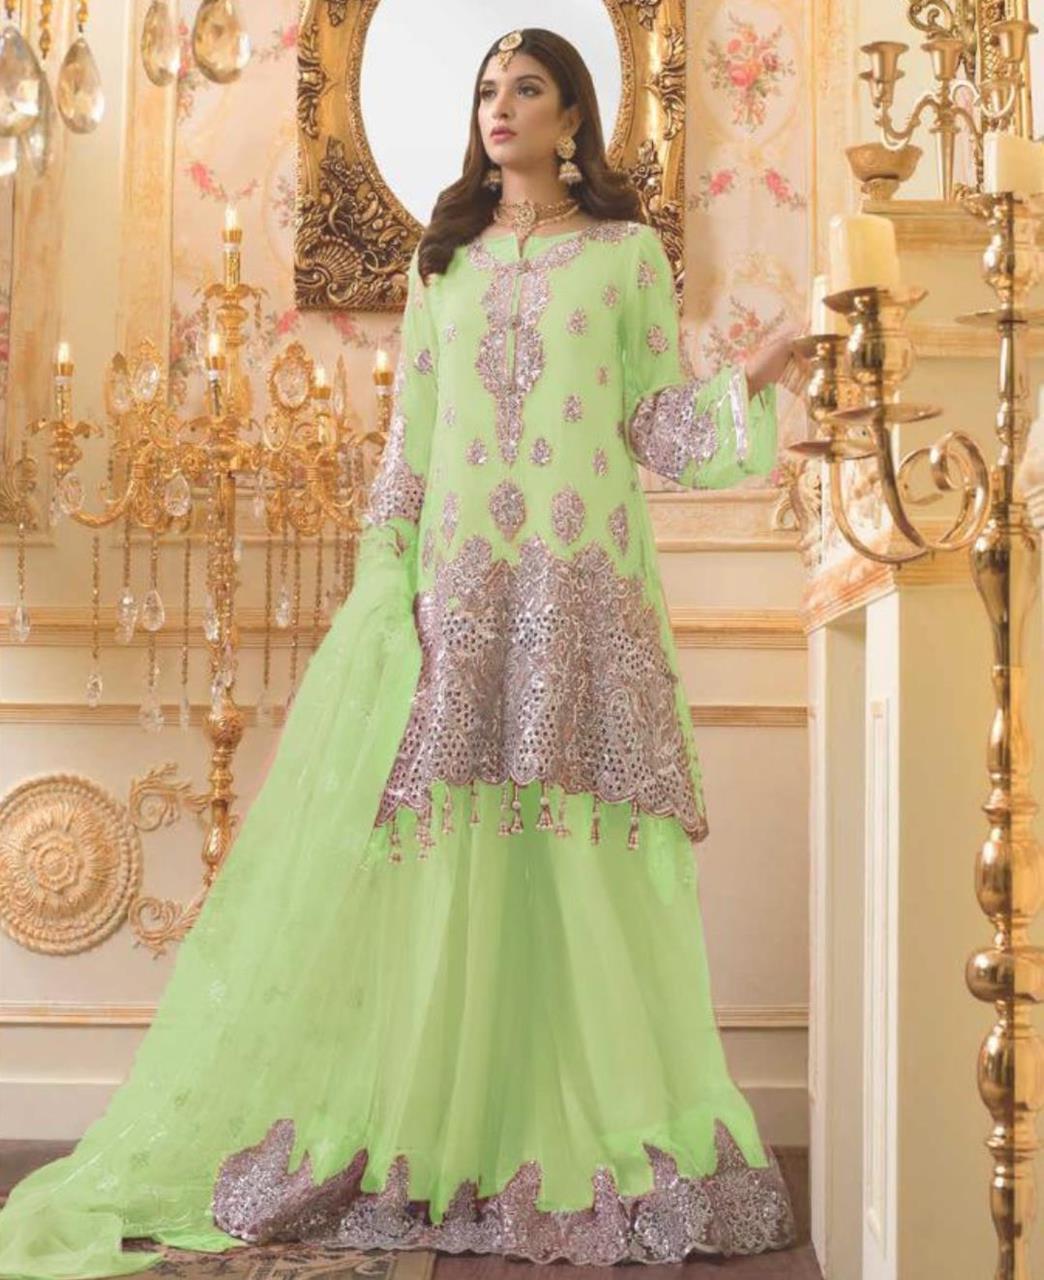 Zari Net Straight cut Salwar Kameez in Light Green